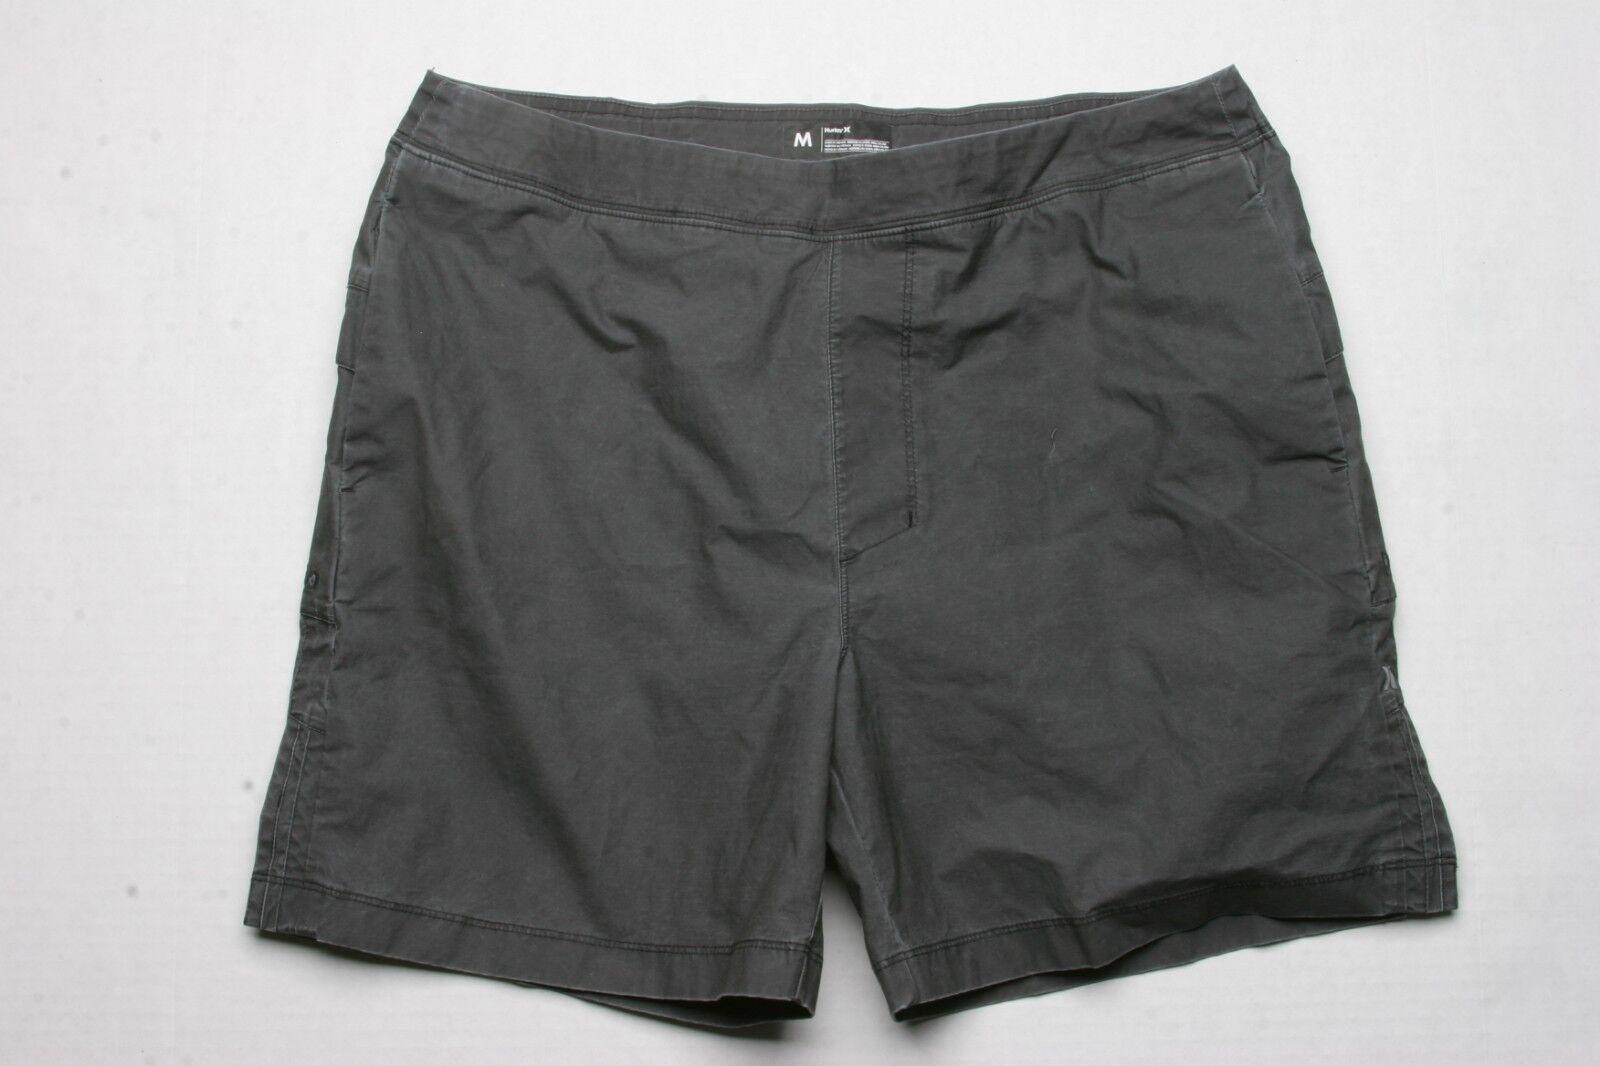 5d3defa346f673 Breathe Corto (M) Hurley Drifit otszno22443-Shorts - www ...